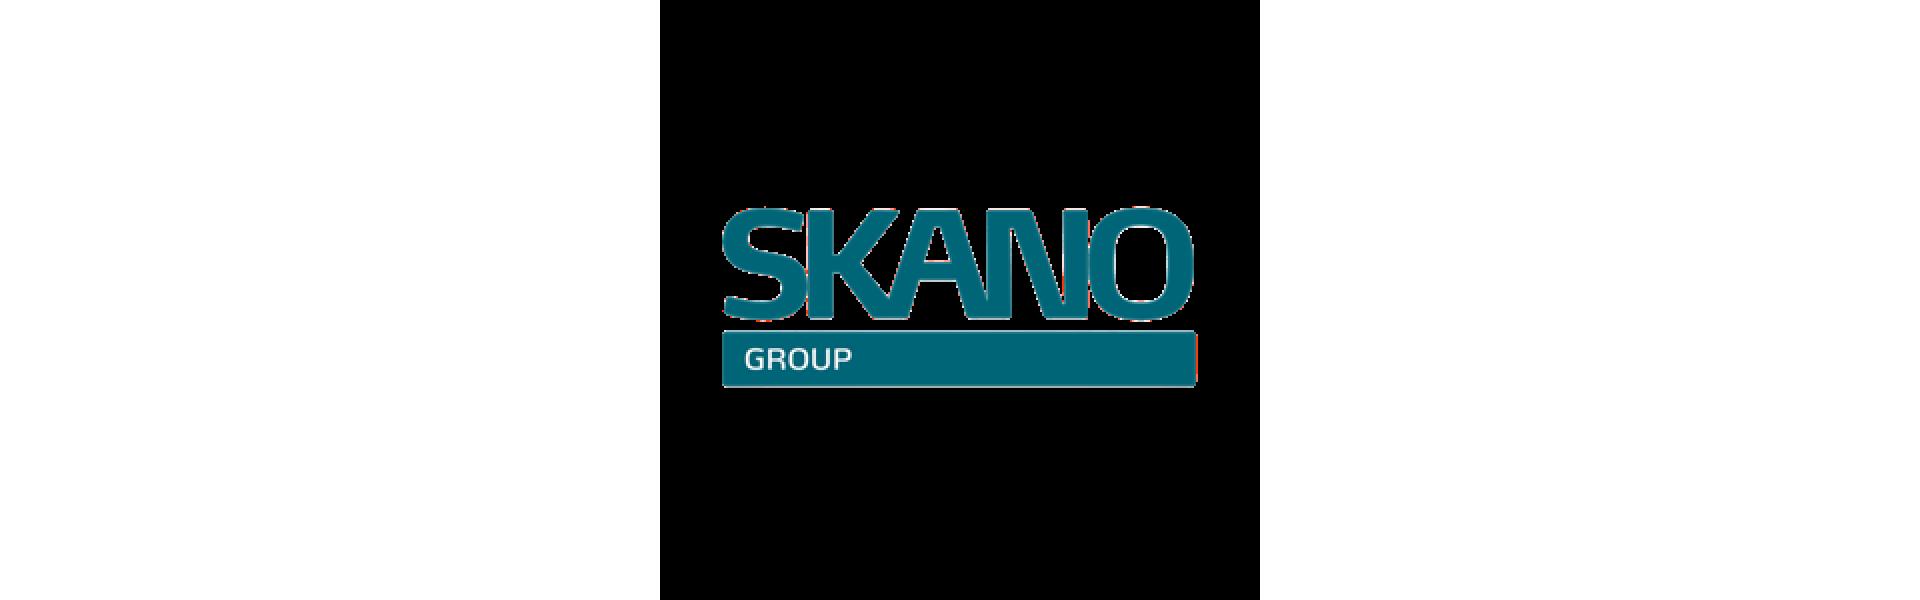 Skano Group © Parket-Home